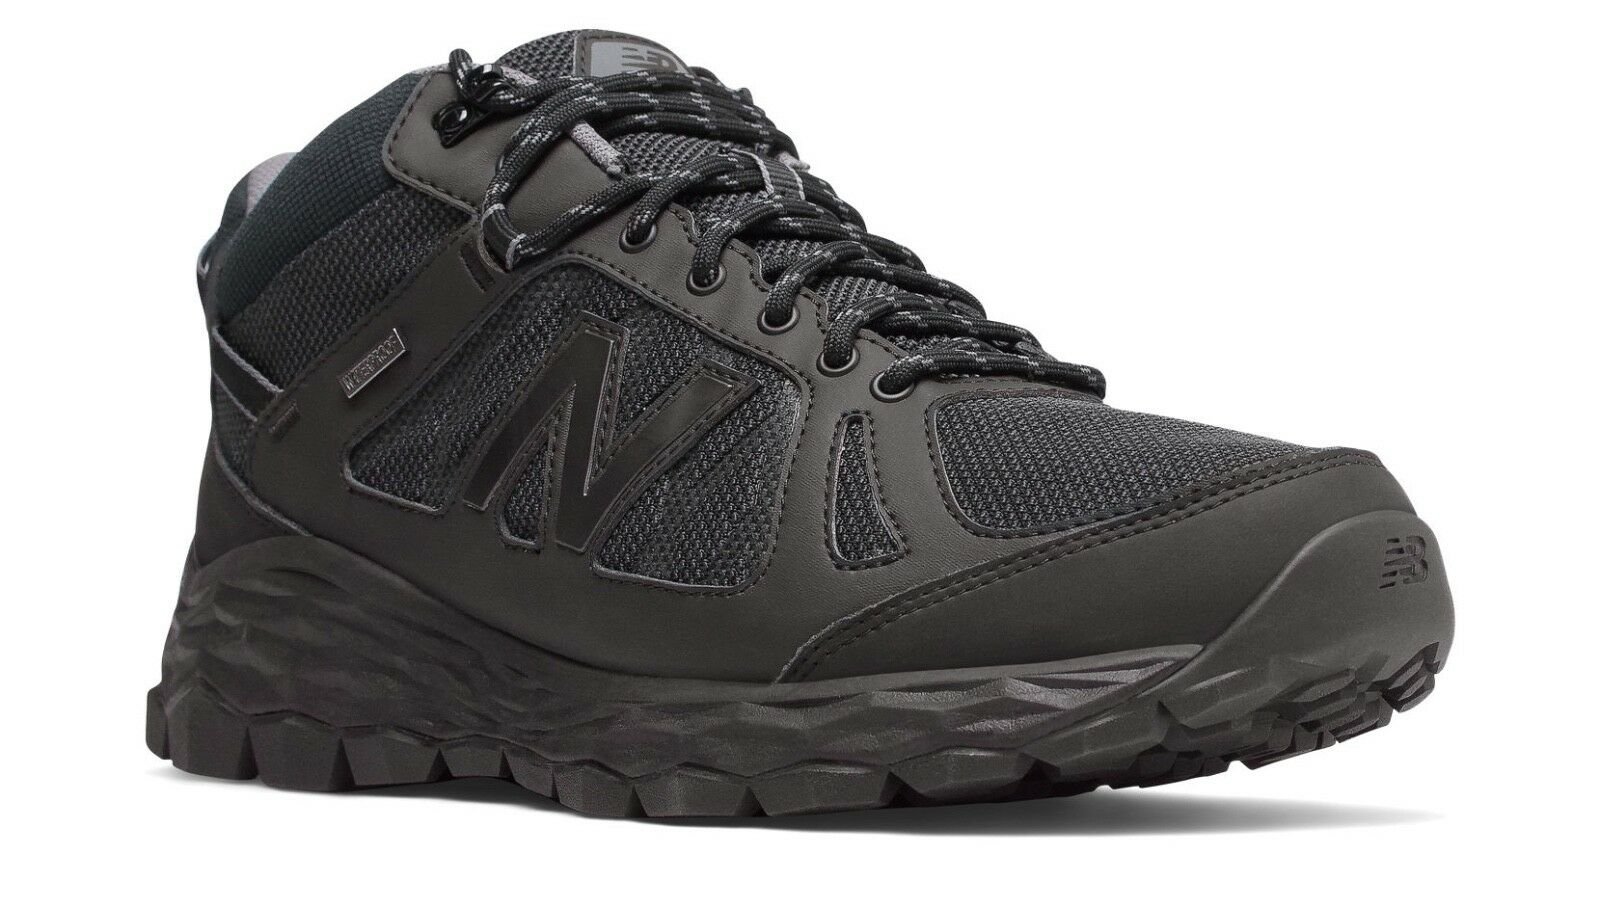 Men's New Balance 1450 US 8 4E MW1450WK Trail Walking